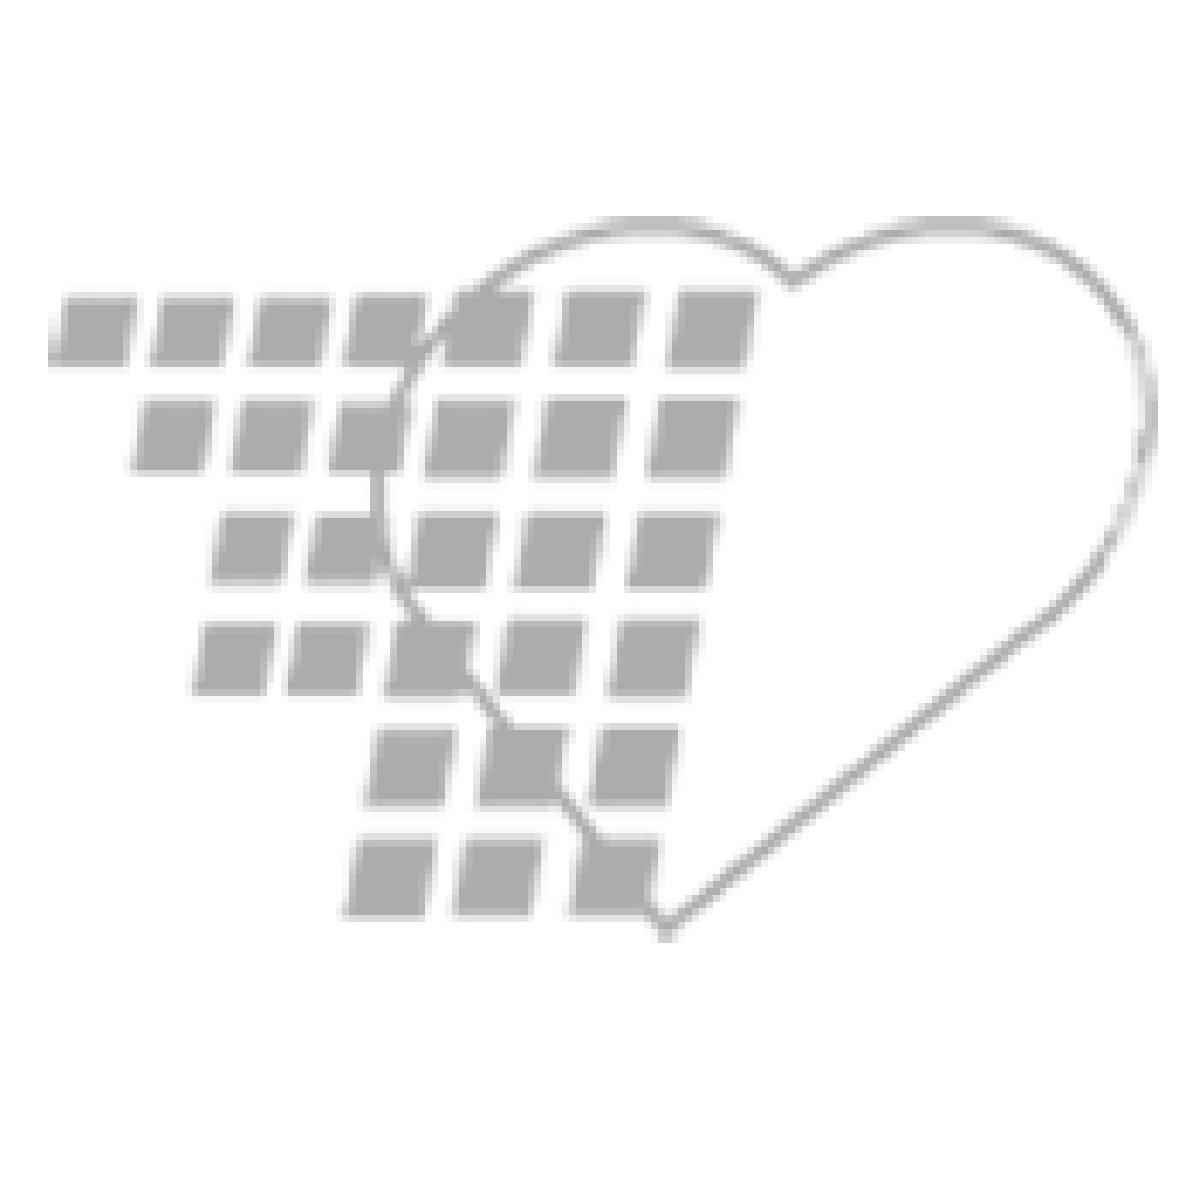 04-50-0572-WDGWDBLU - Clinton Designer Blood Drawing Chair with Drawer